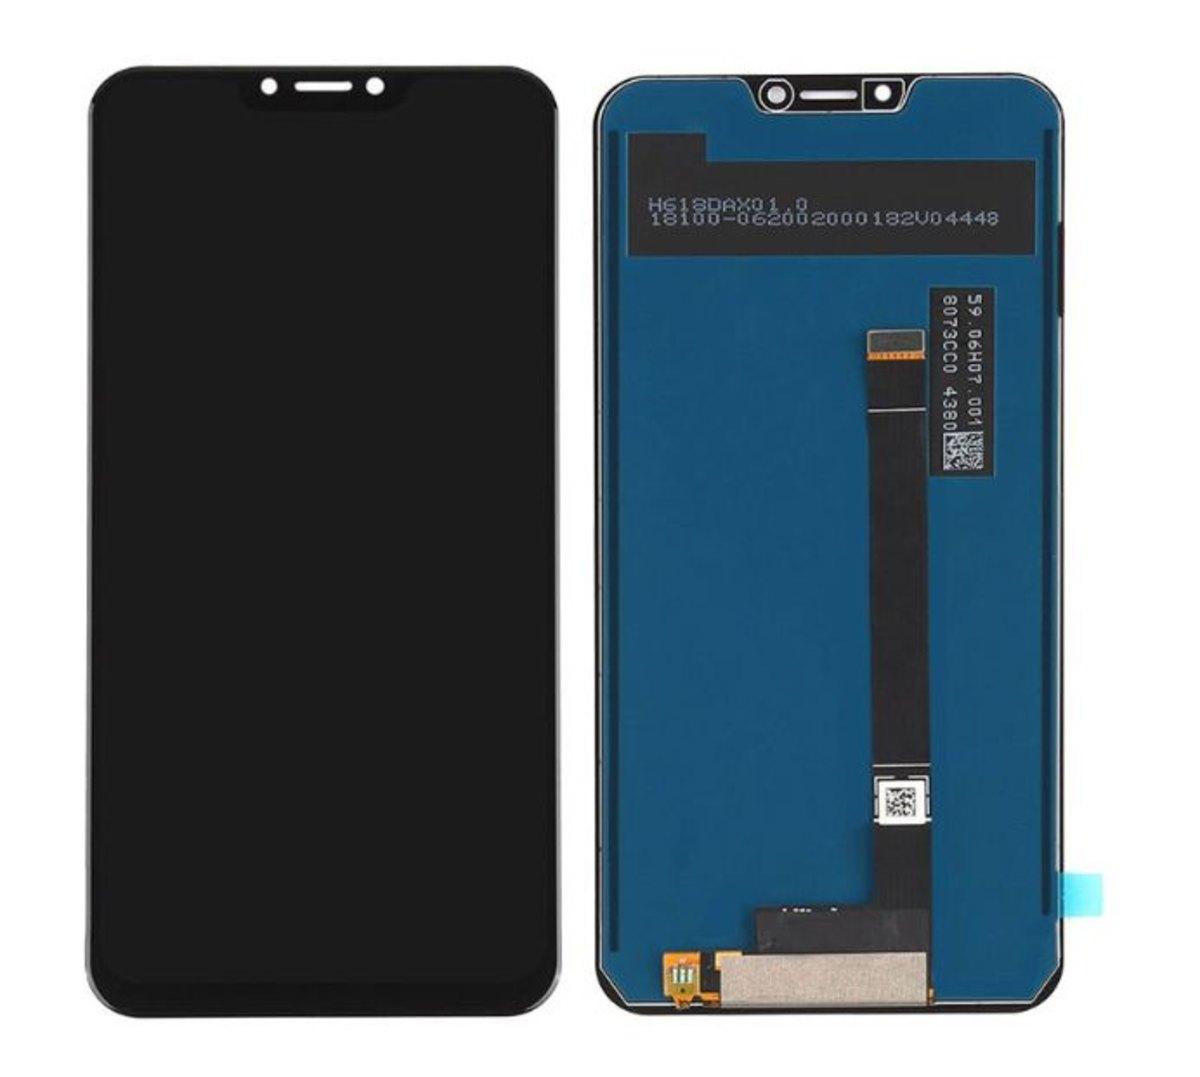 Tela Frontal Touch e Display Asus Zenfone 5 ZB620KL ZS620KL Sem aro Preto